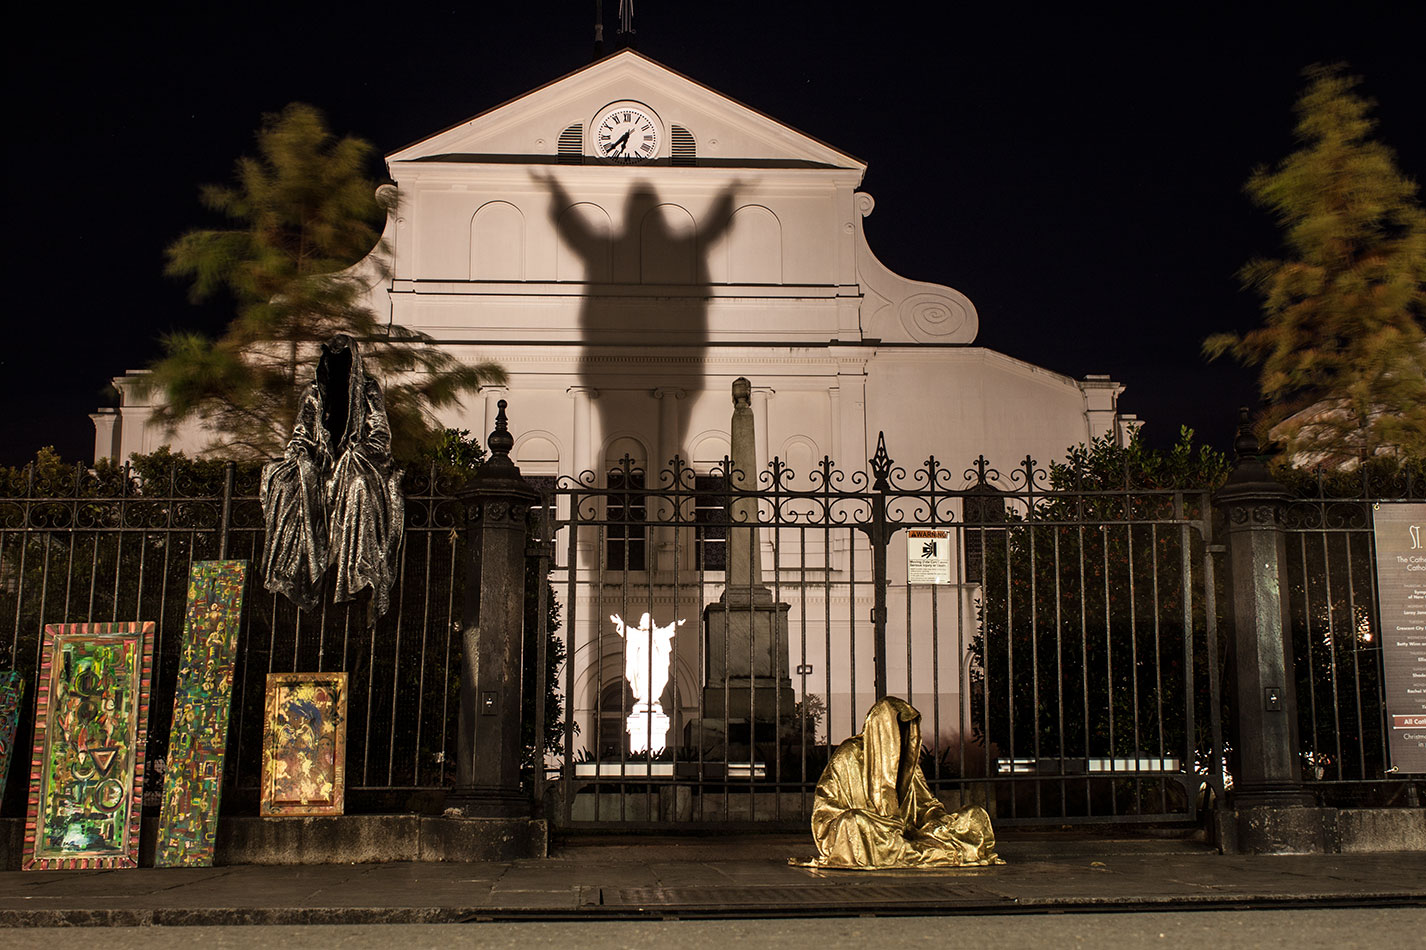 public-art-show-New-Orleans-Louisiana-usa-guardians-of-time-manfred-kili-kielnhofer-contemporary-fine-art-modern-arts-design-antiques-sculpture-5455